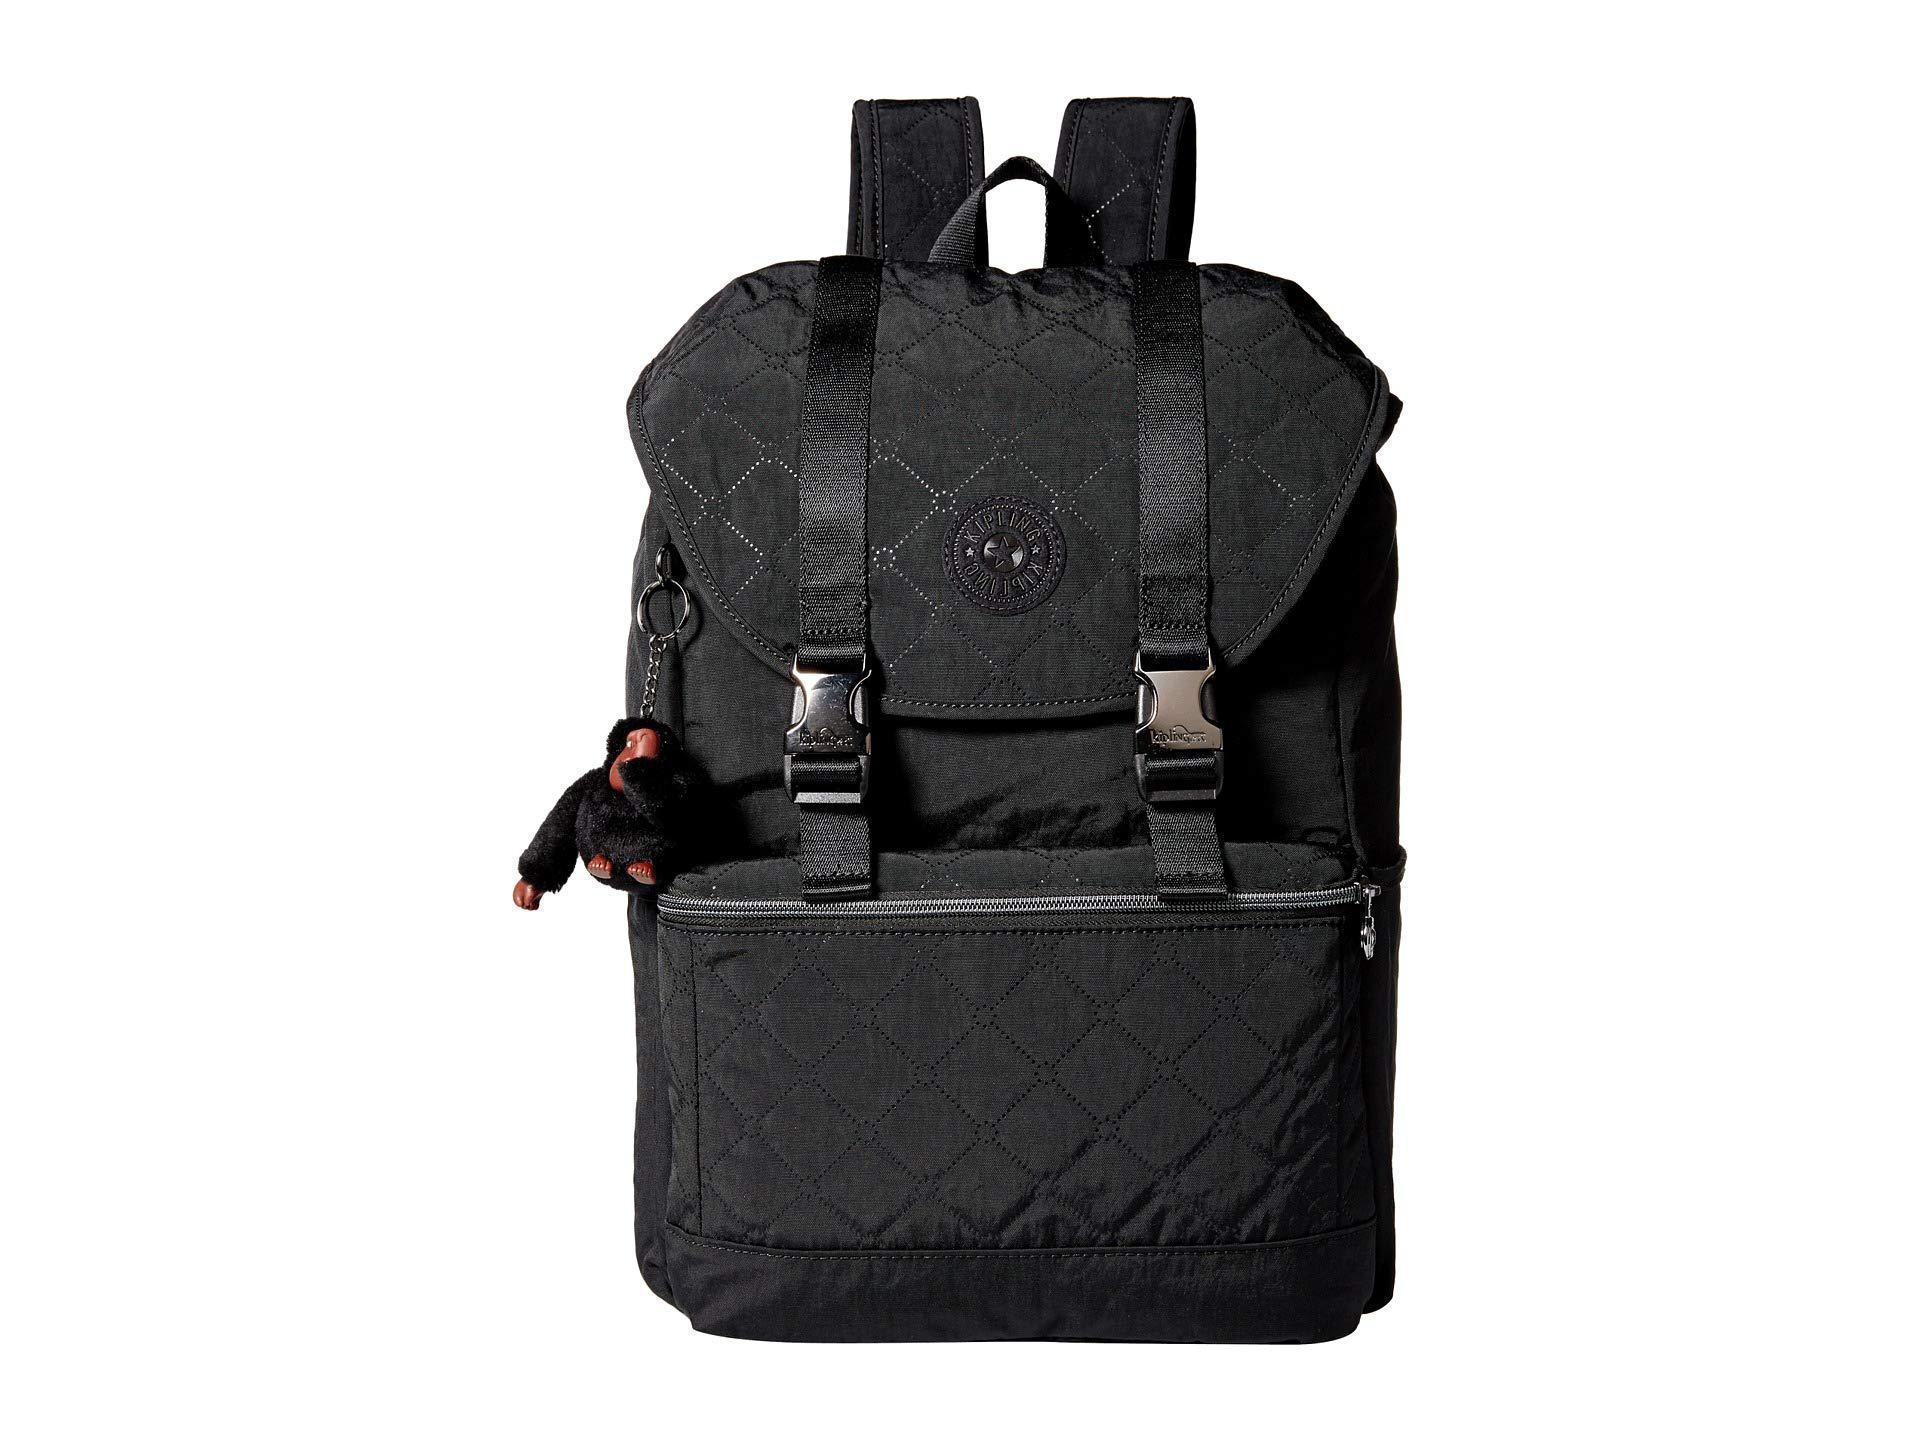 d7b593d7a3c9 Lyst - Kipling Experience Backpack (black) Backpack Bags in Black